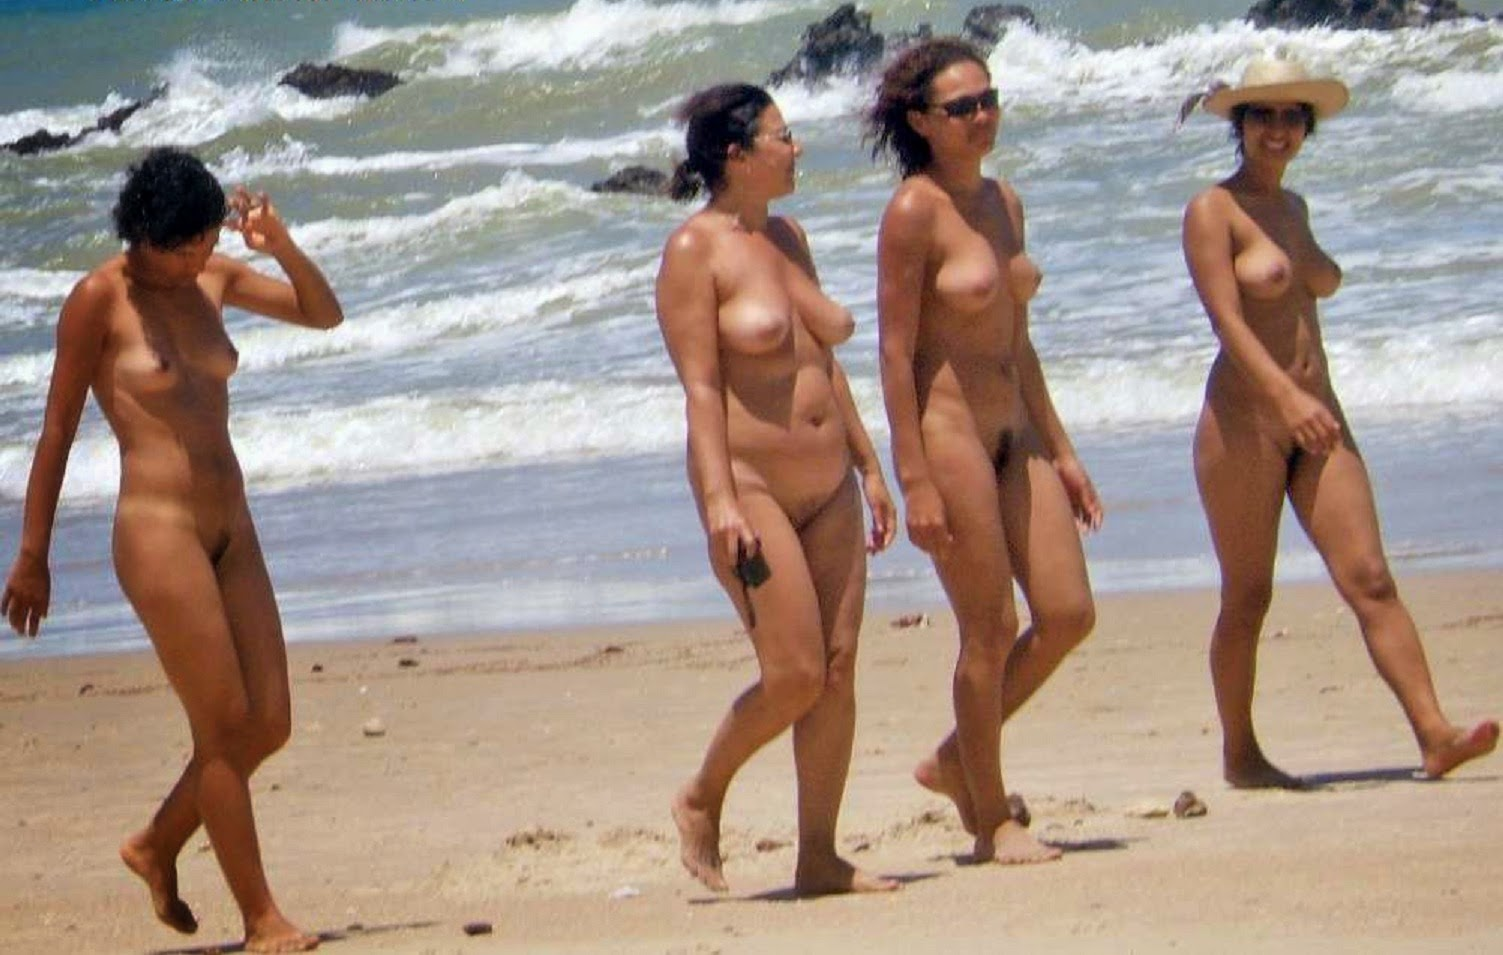 Nude beach experience